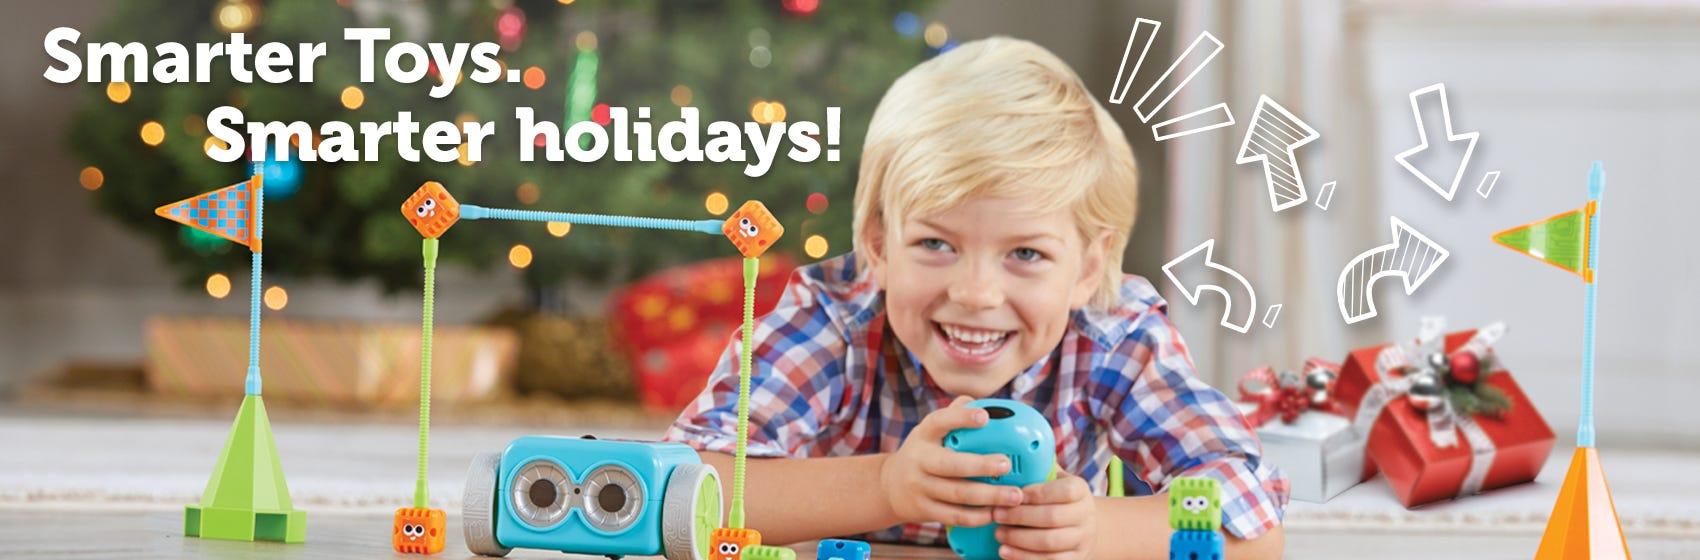 Smarter Toys, Smarter holidays!